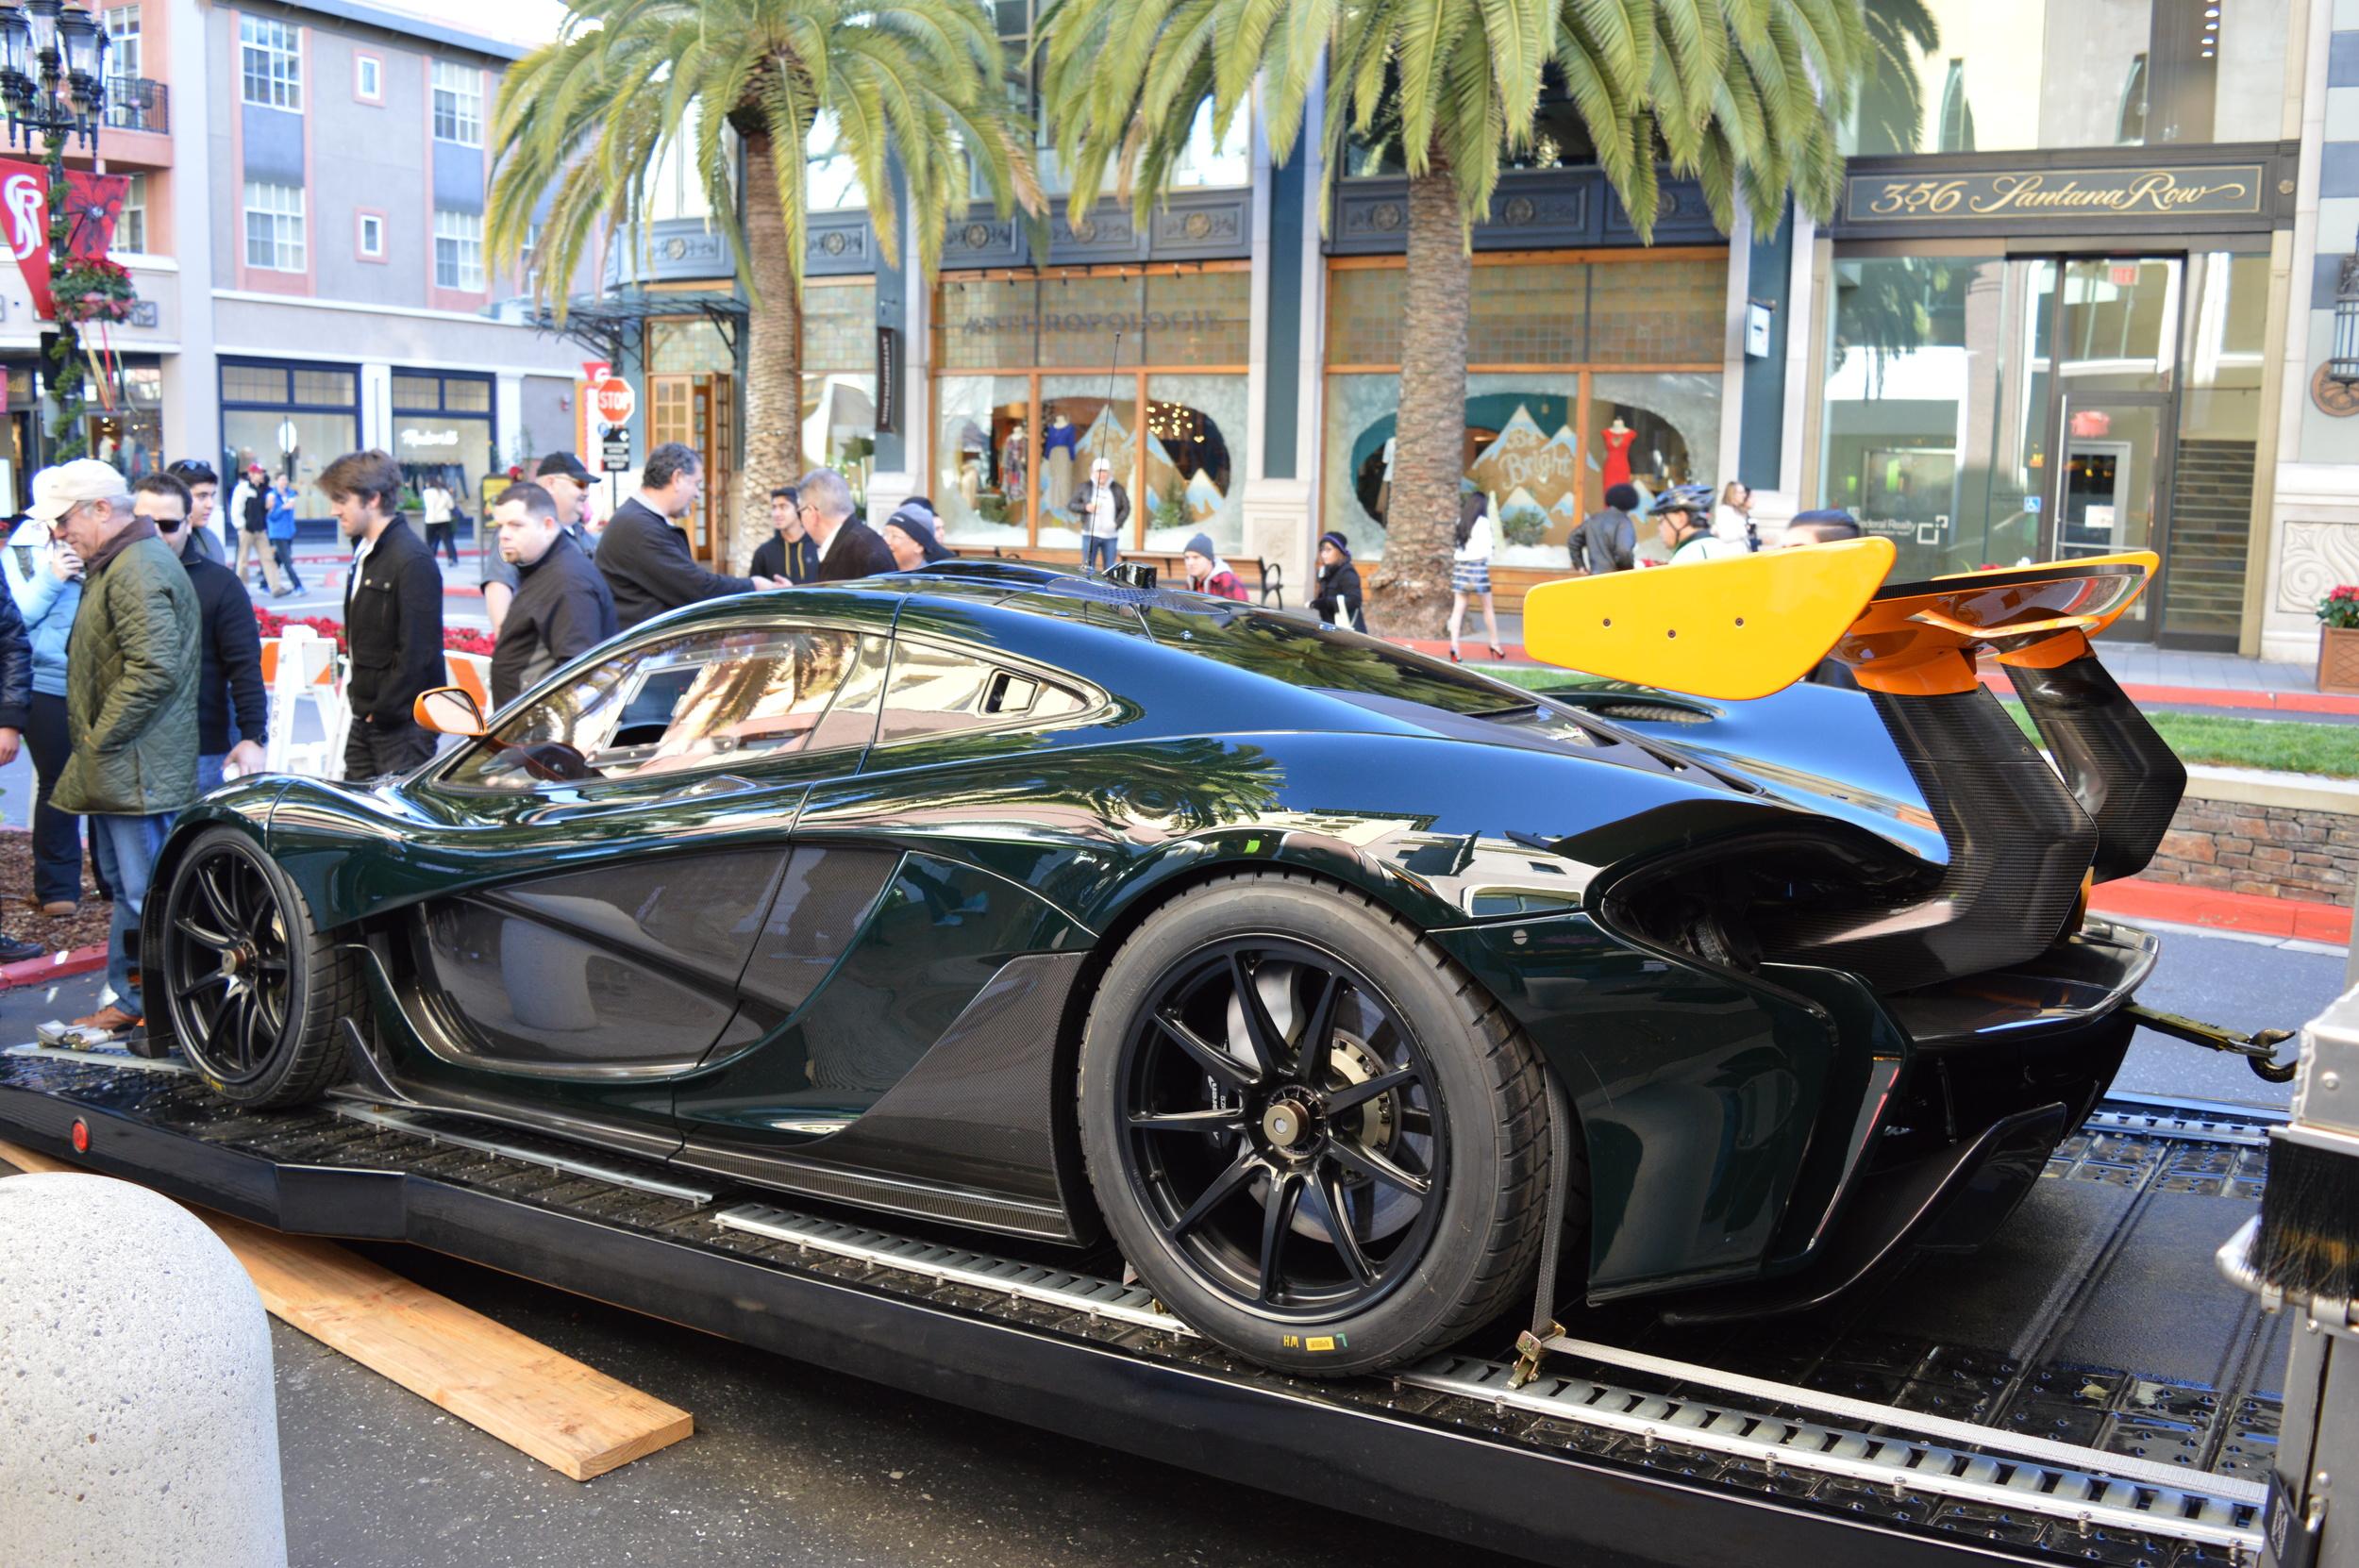 Credits: Dennis Noller - McLaren P1 GTR - Canepa Green with McLaren Orange accents